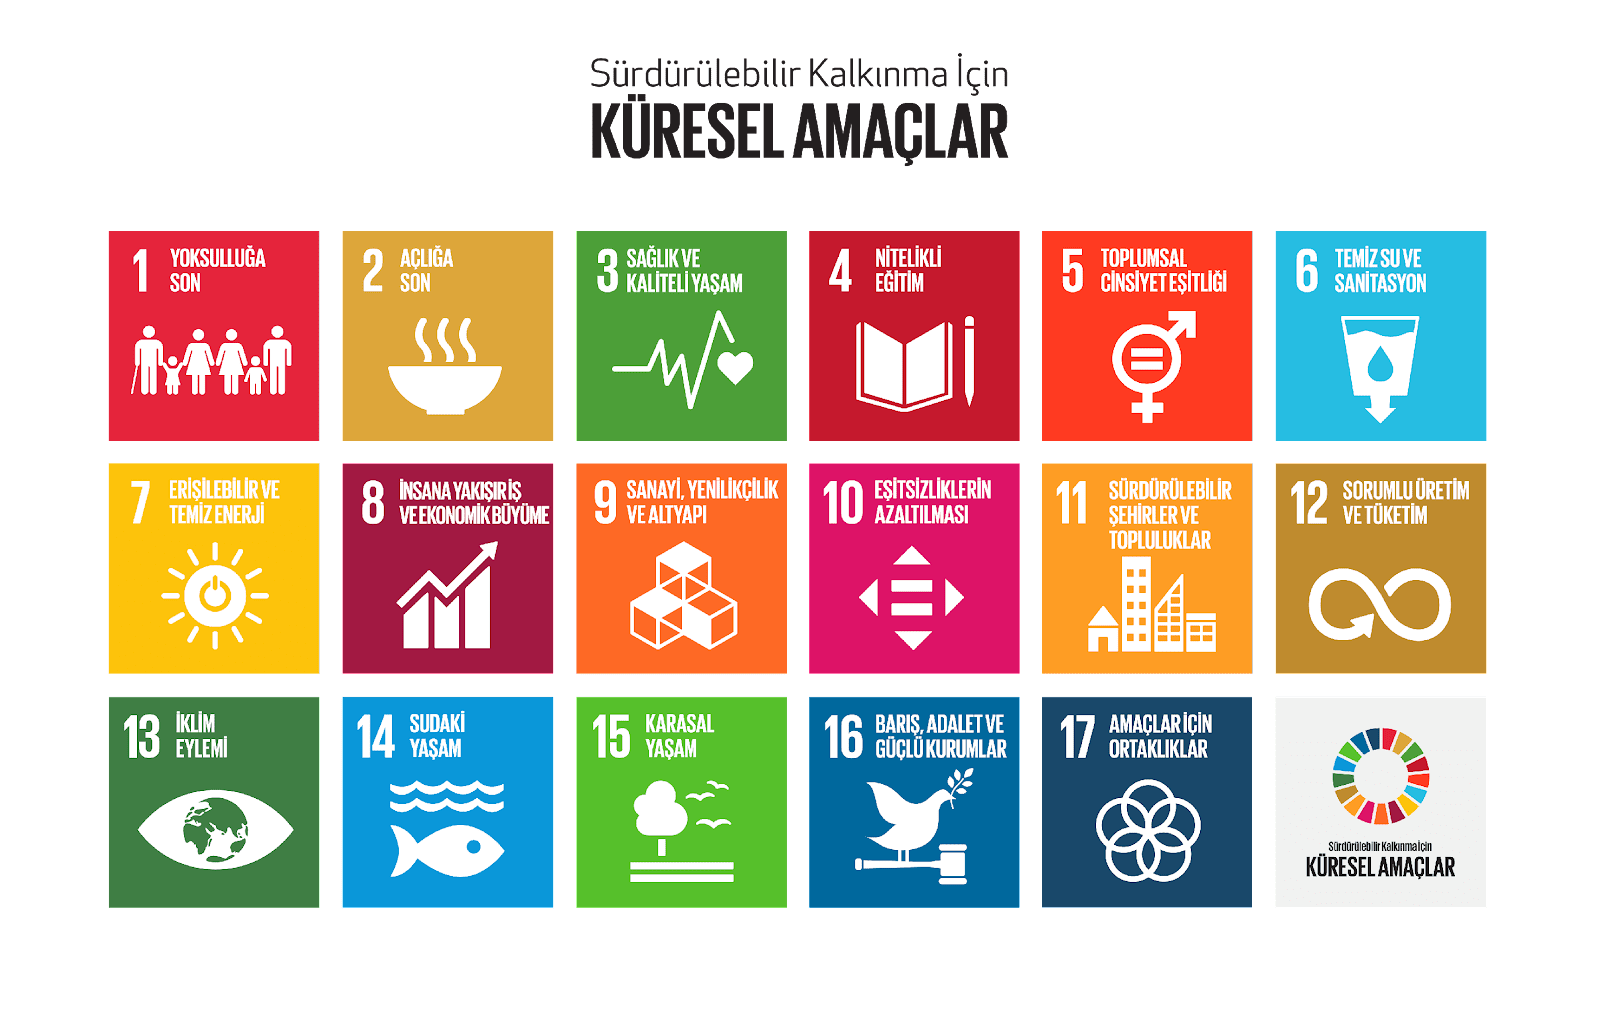 C:\Users\Ata Selçuk\Desktop\SUSTAINABILITY\SDGs\SKA.png